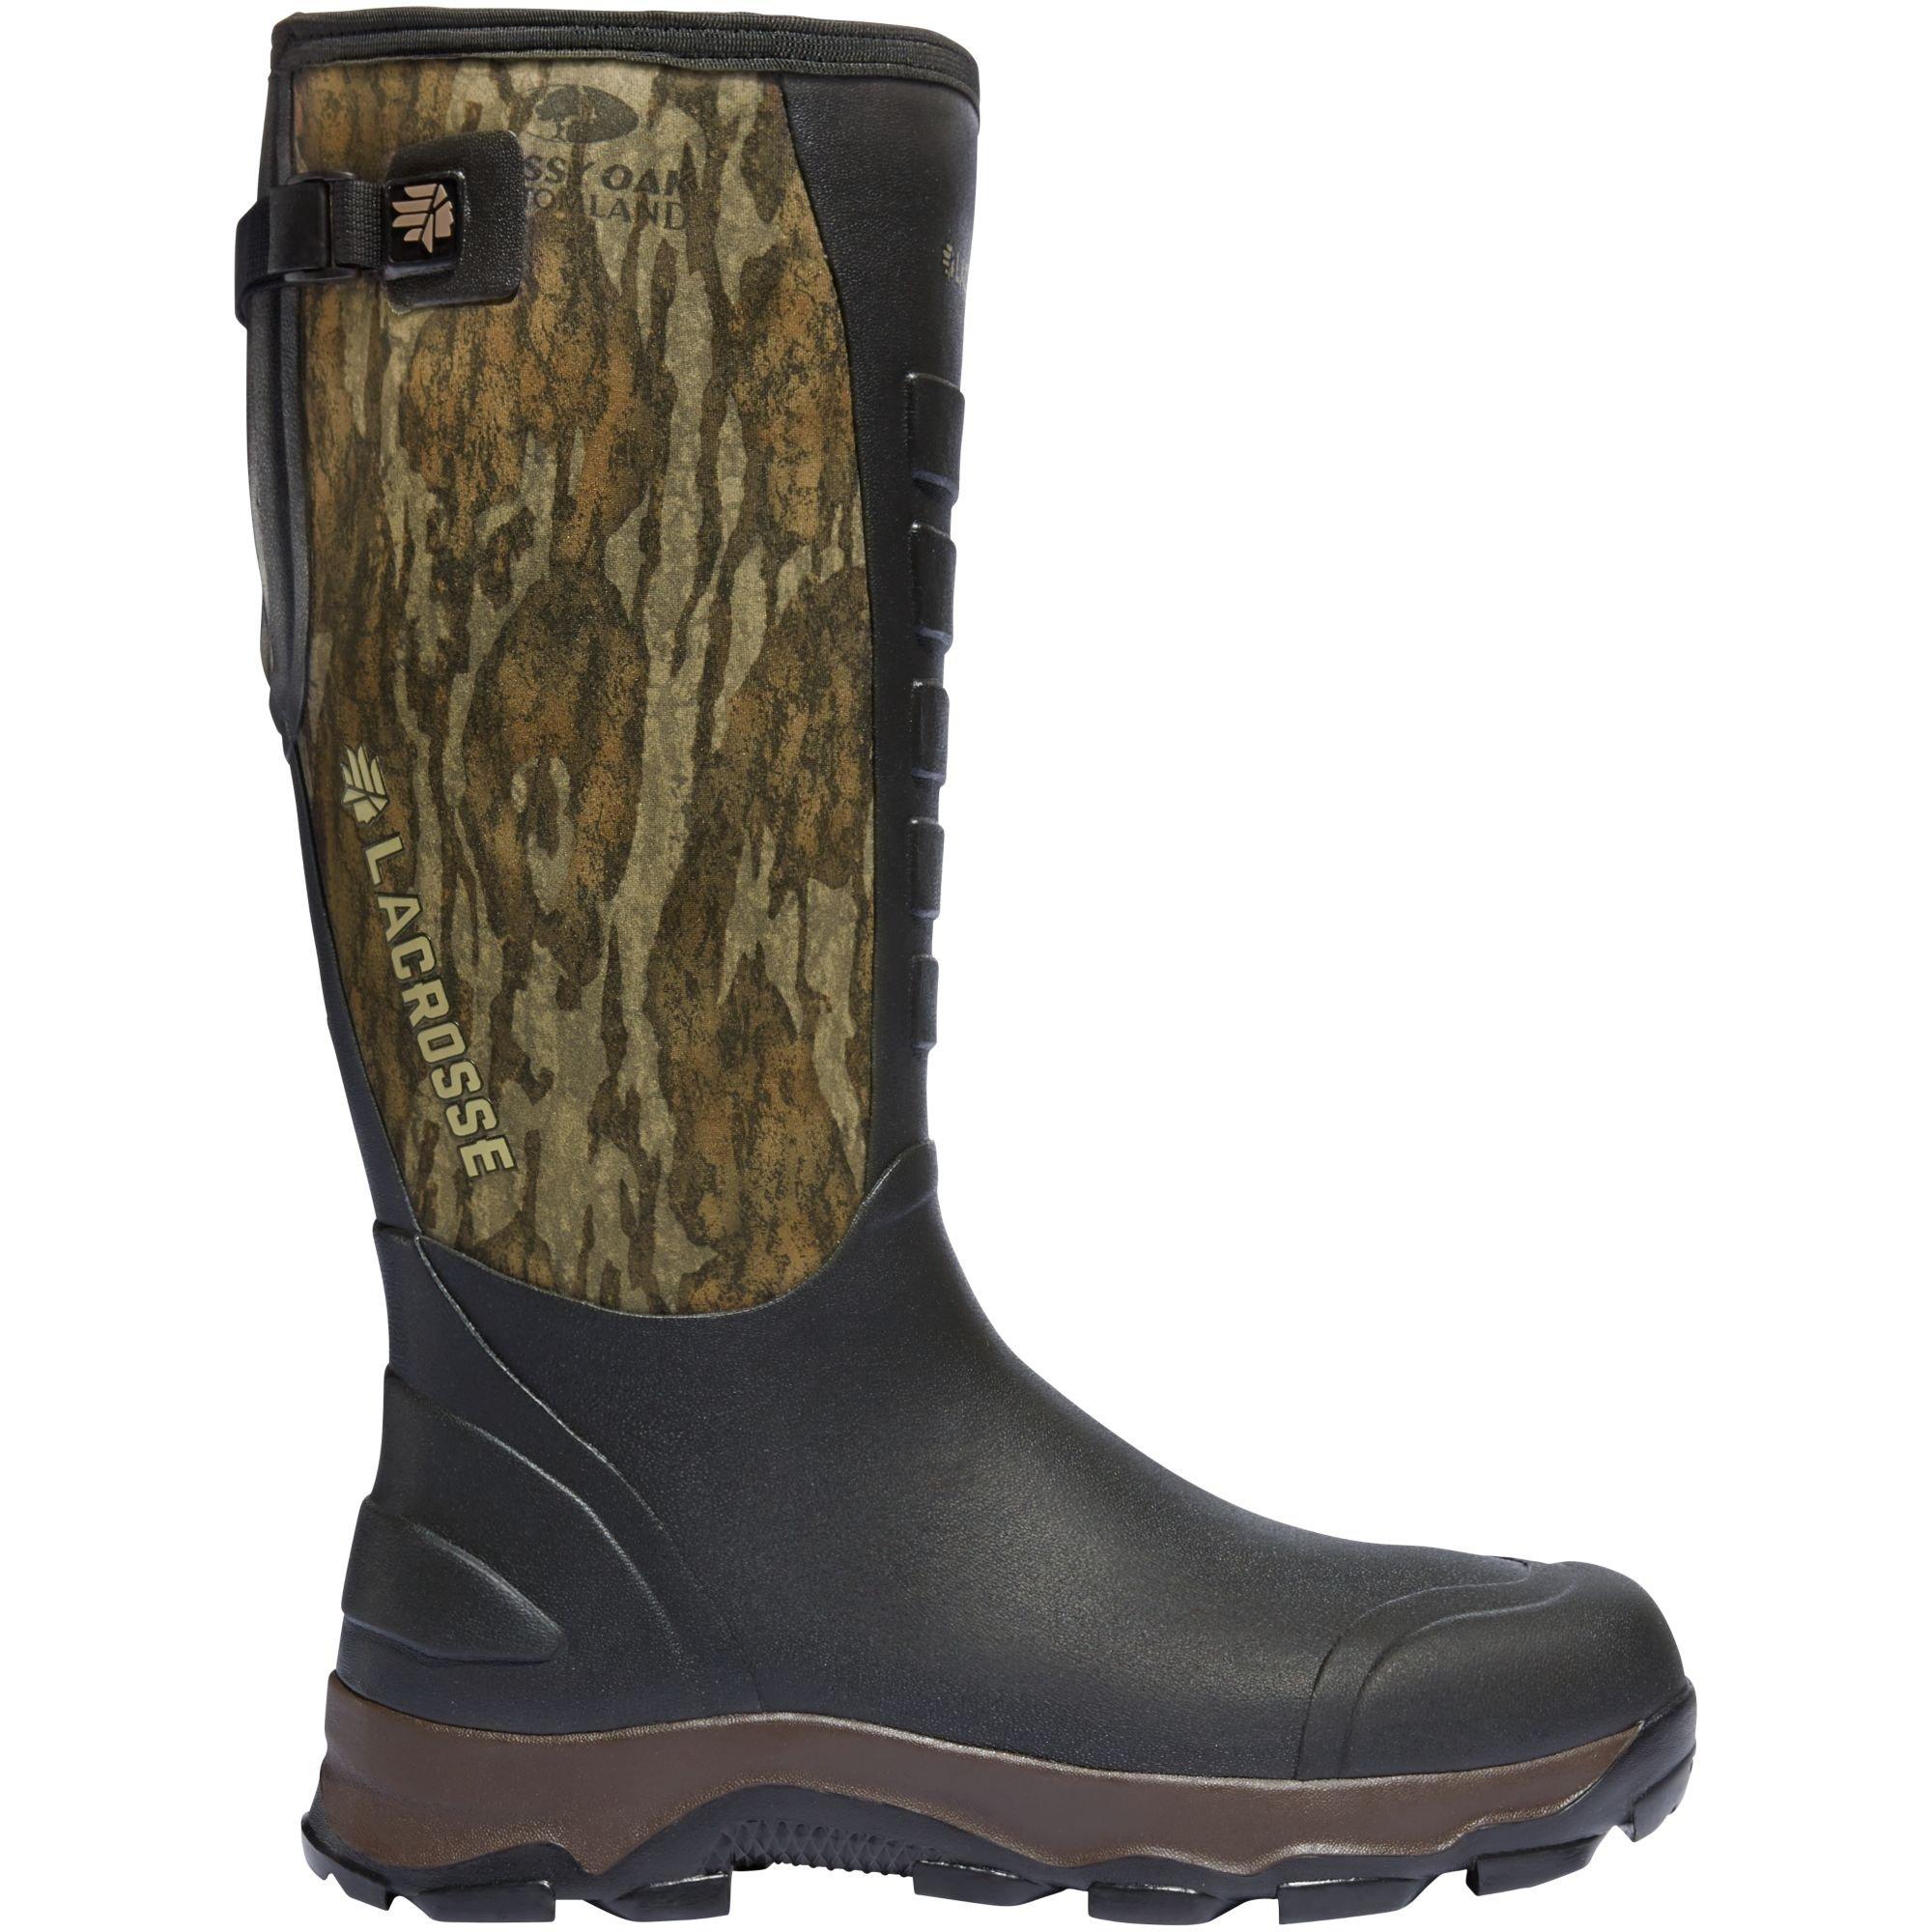 Lacrosse Men's 4xAlpha 16'' Hunting Boot, Mossy Oak Bottomland, 6 M